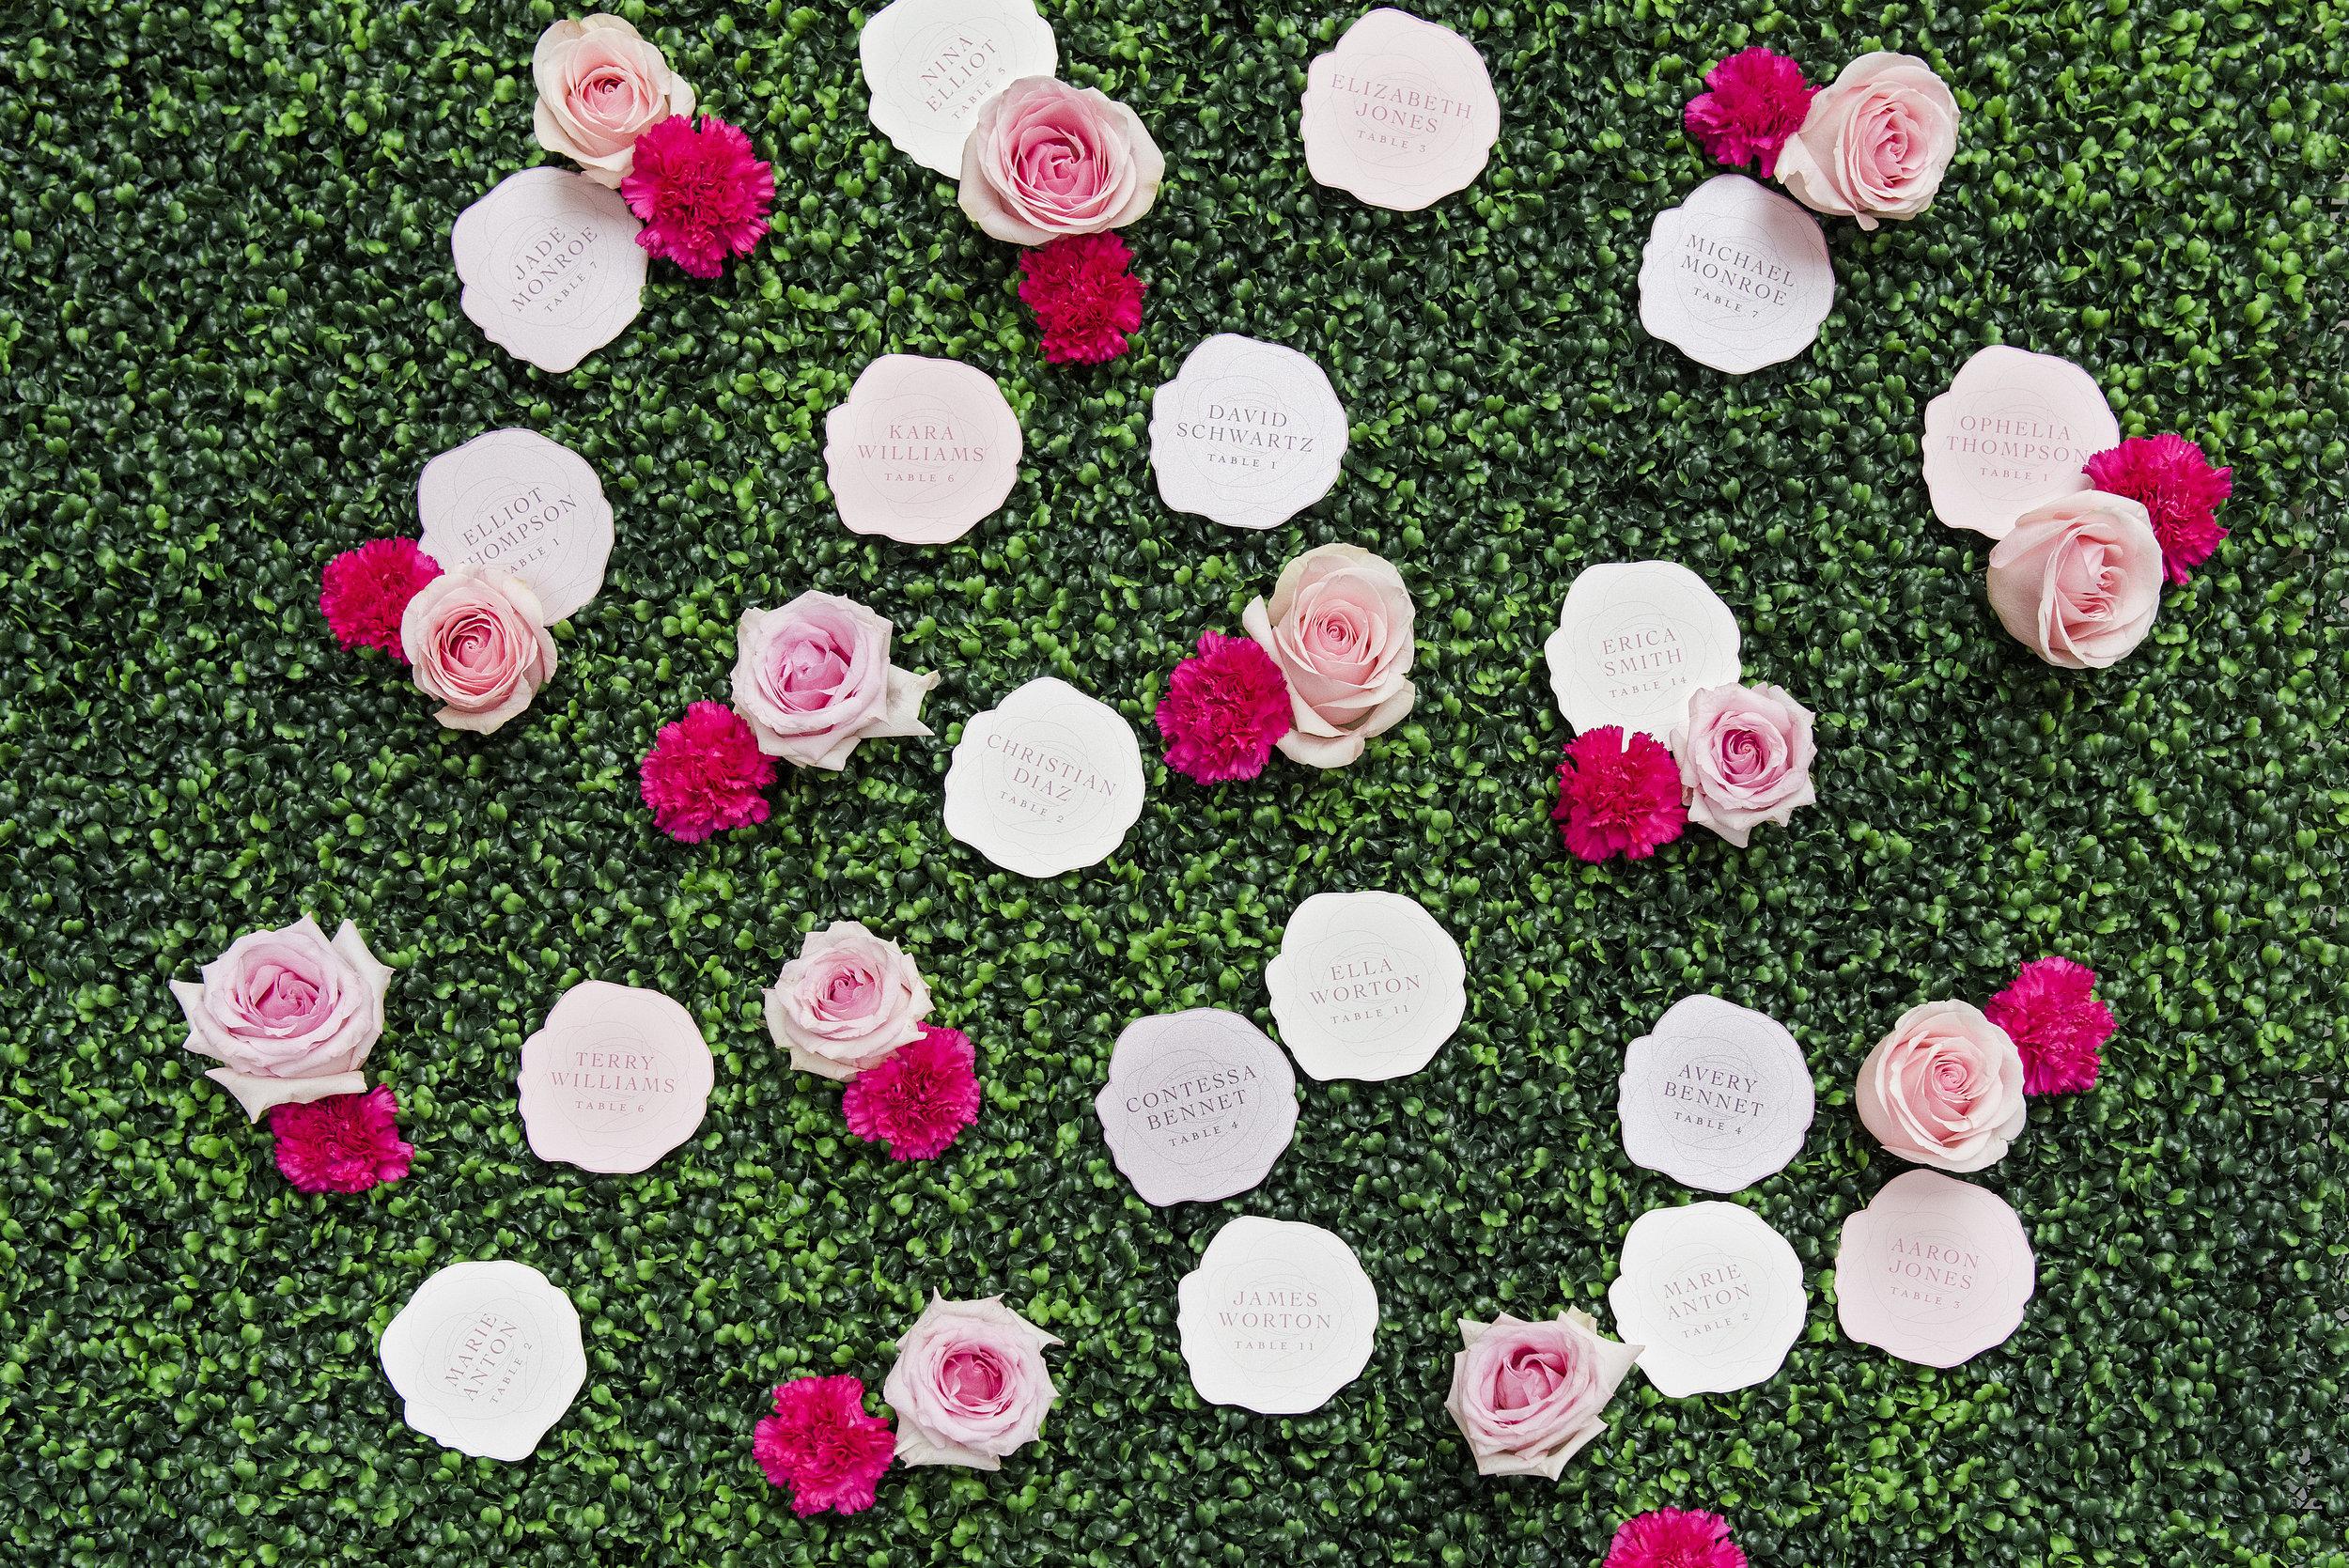 August In Bloom - Rose escort cards - Dior Darling (Wedluxe)